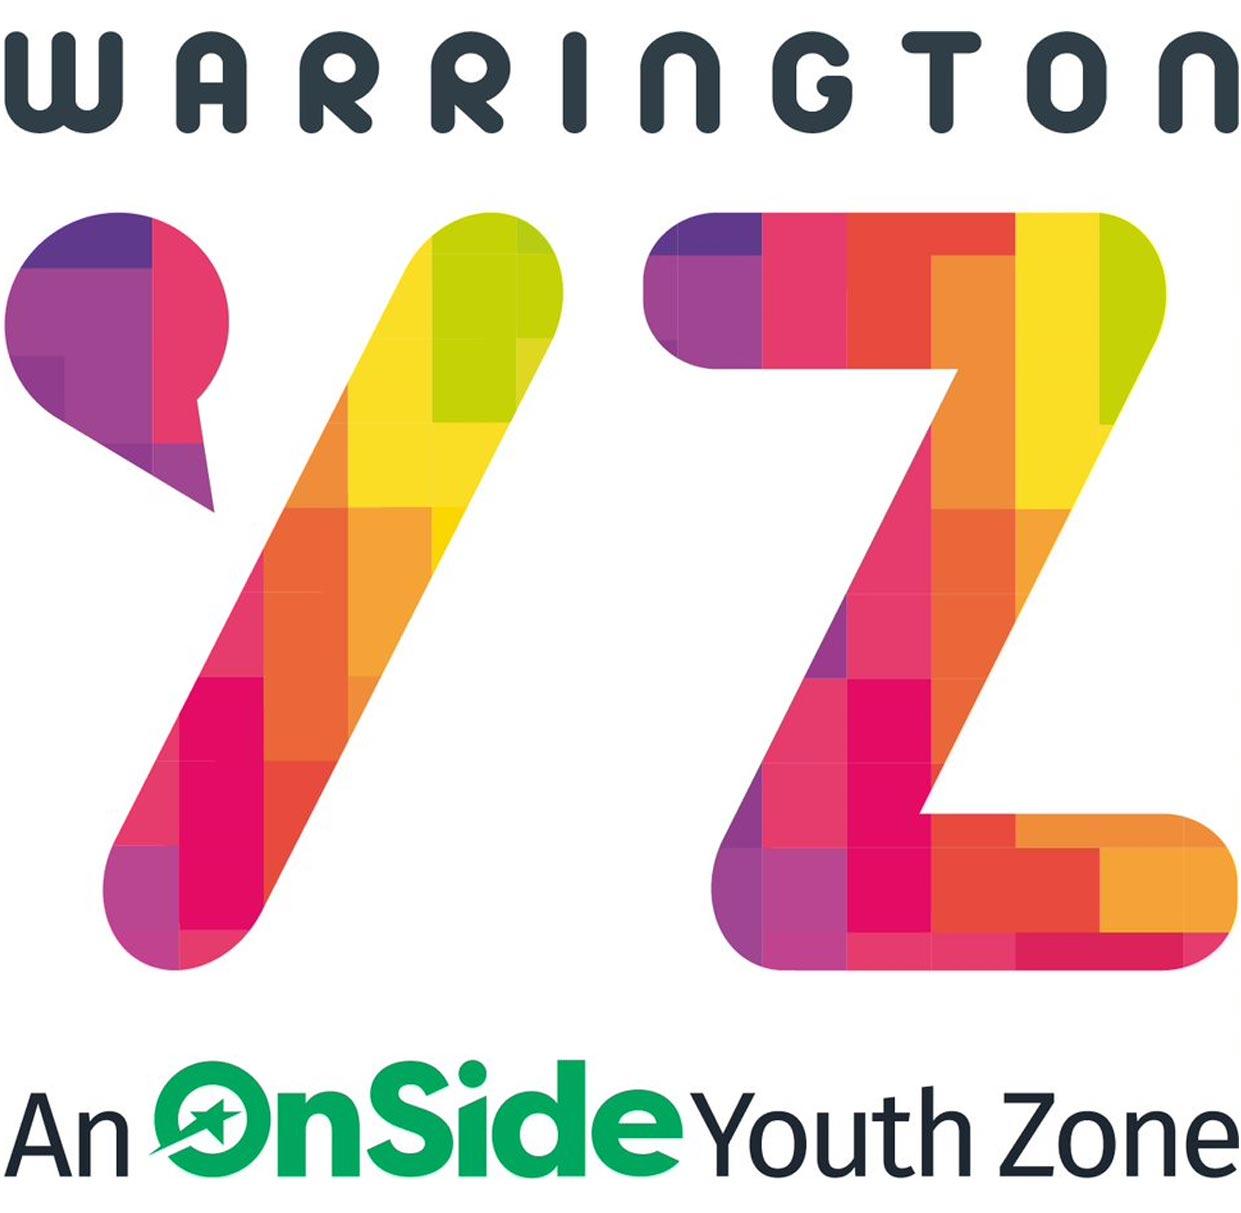 Warrington Youth Zone